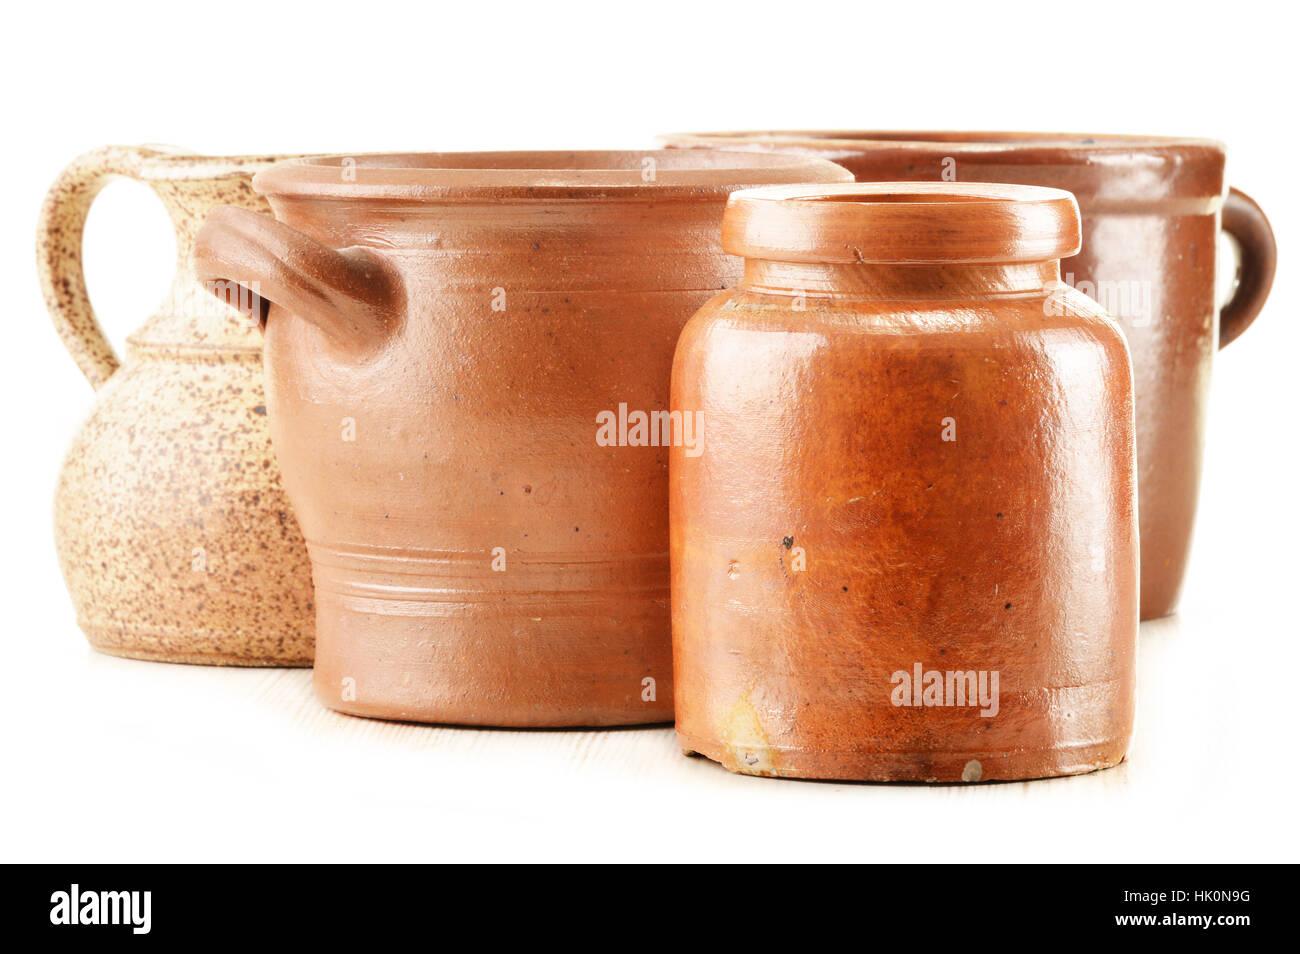 Kitchen cuisine jug food dish meal pitcher handmade kitchen cuisine jug food dish meal pitcher handmade pottery vase reviewsmspy